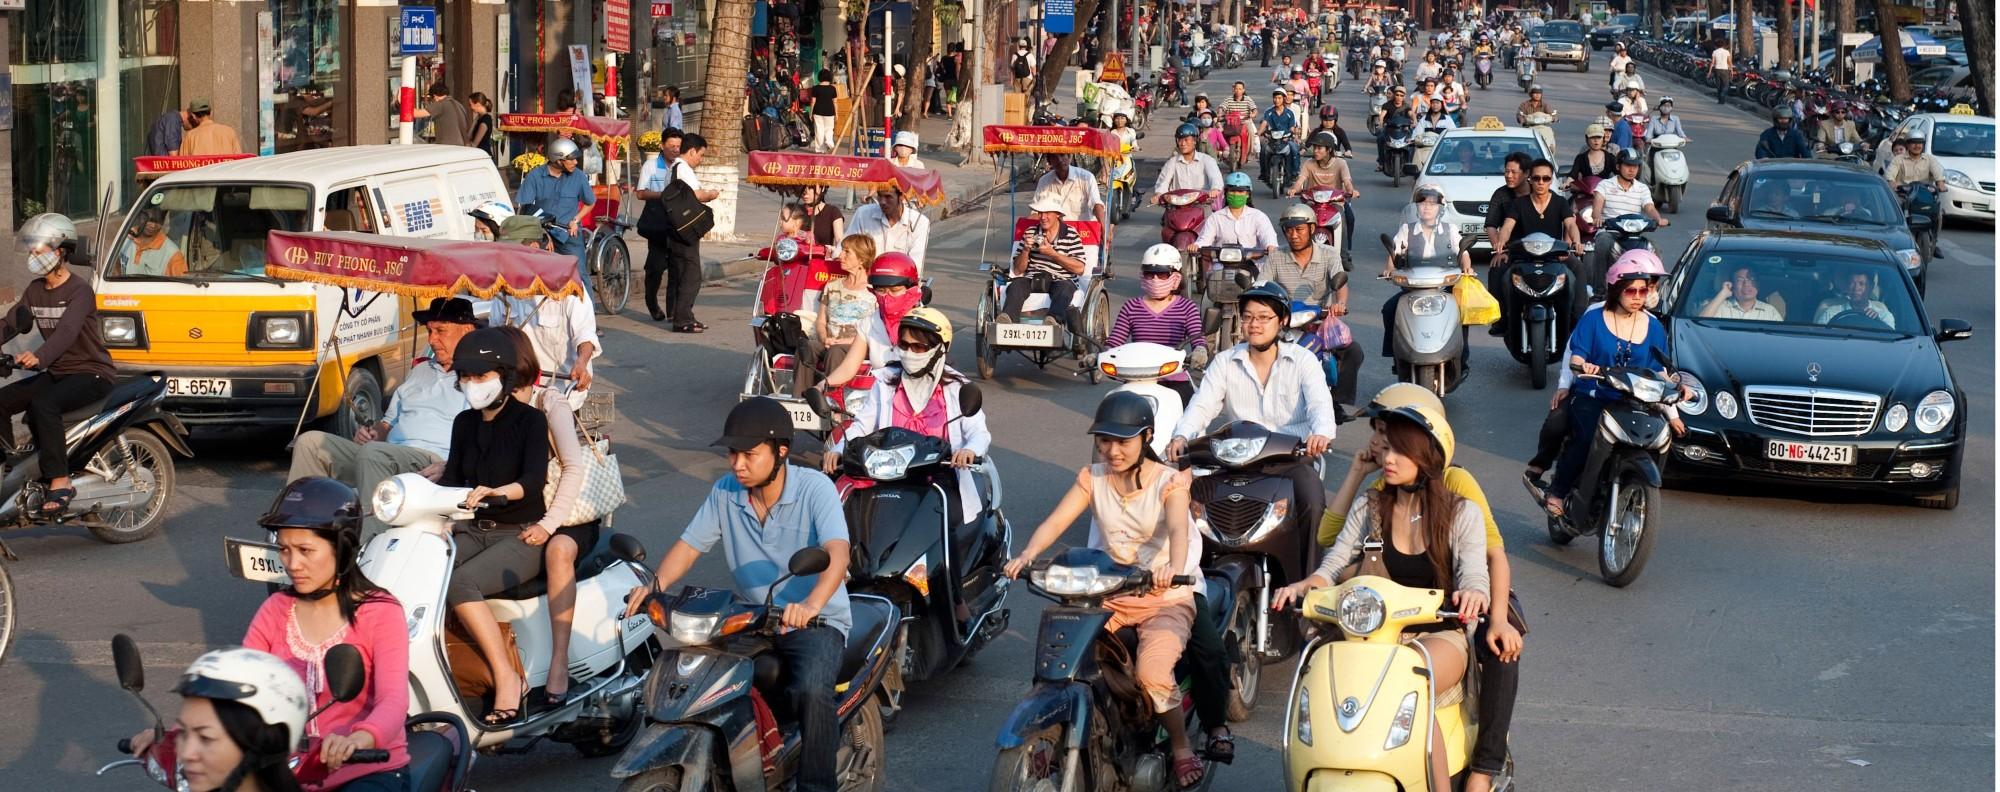 Criticising Asian development bank hanoi address phrase